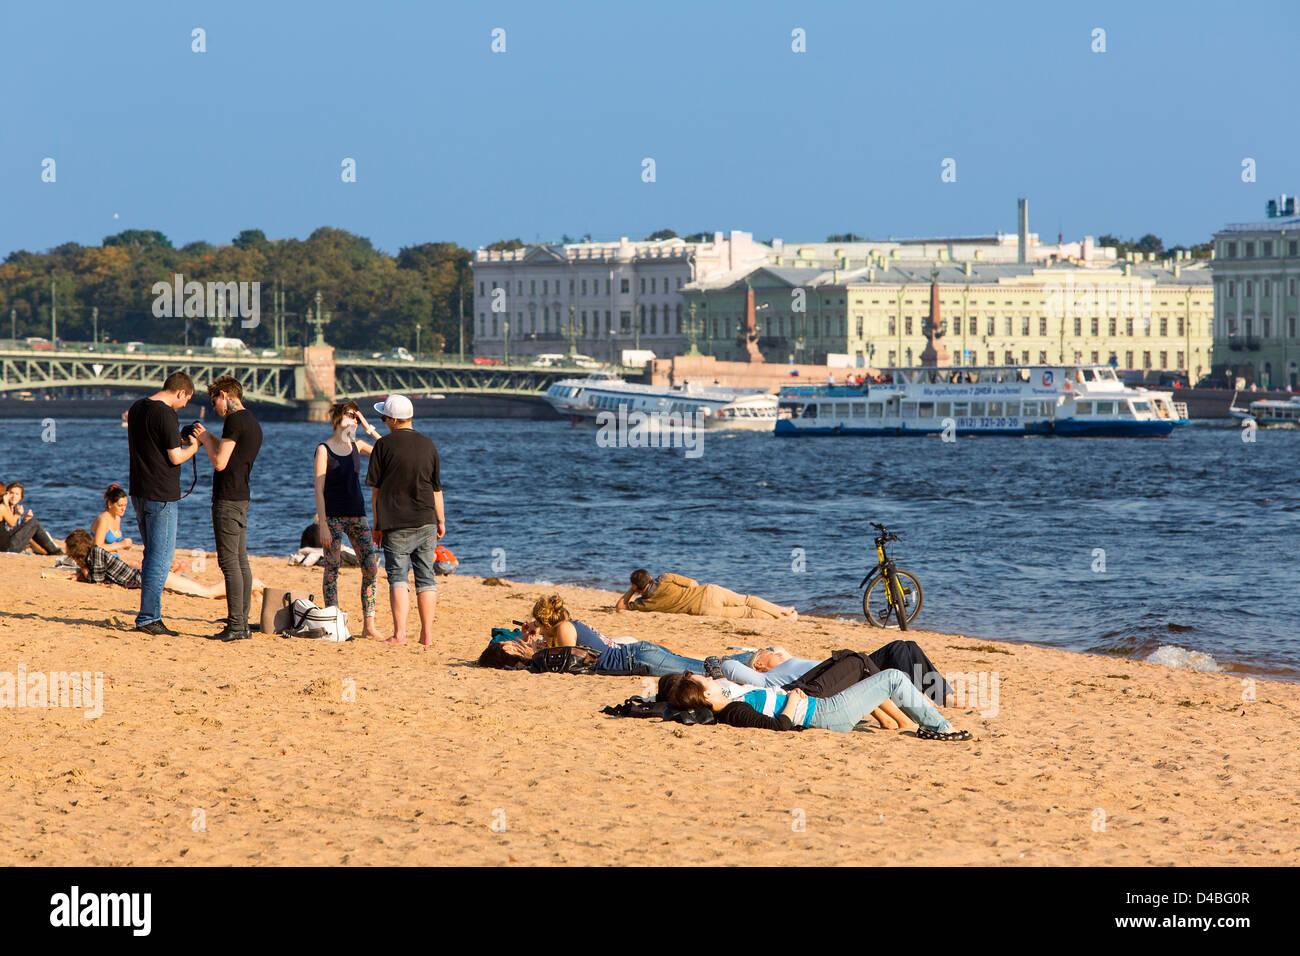 St. Petersburg, People Sunbathing Along the Neva River - Stock Image